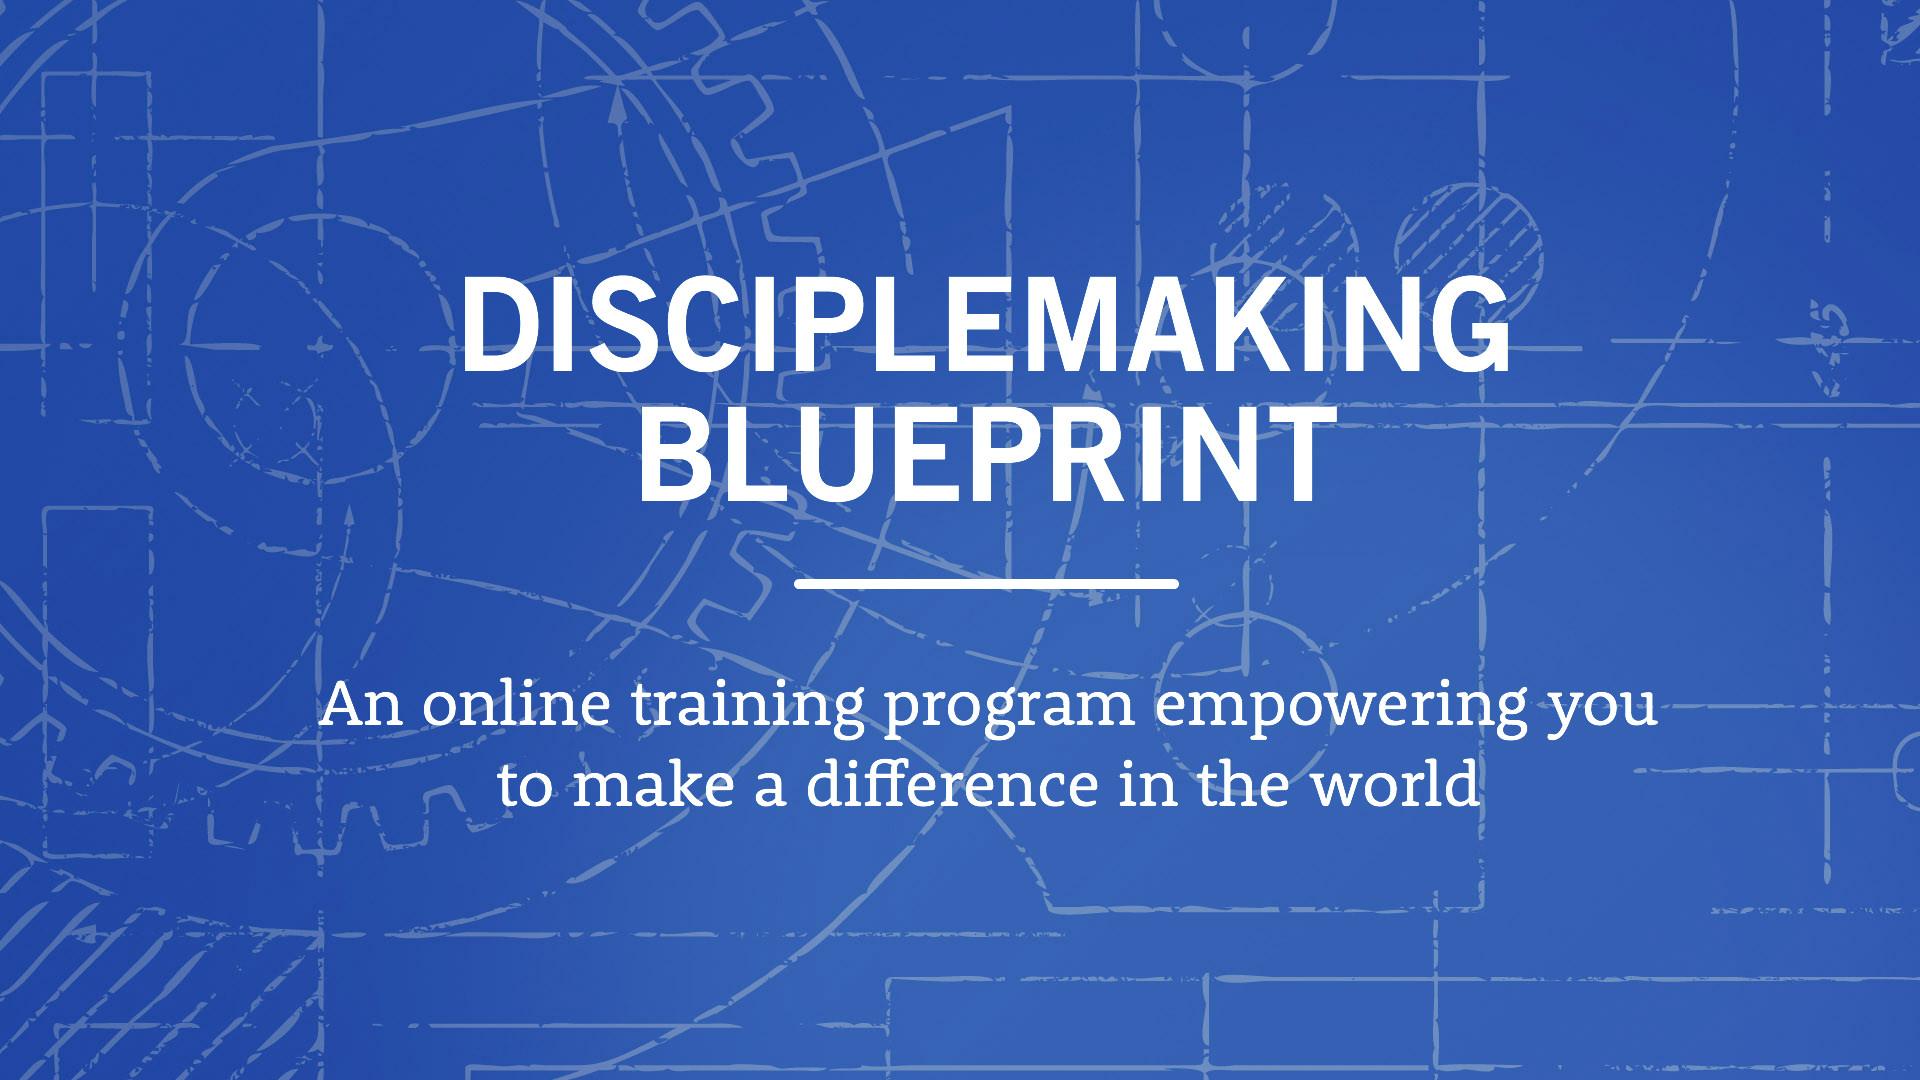 Your disciplemaking blueprint verge network malvernweather Gallery